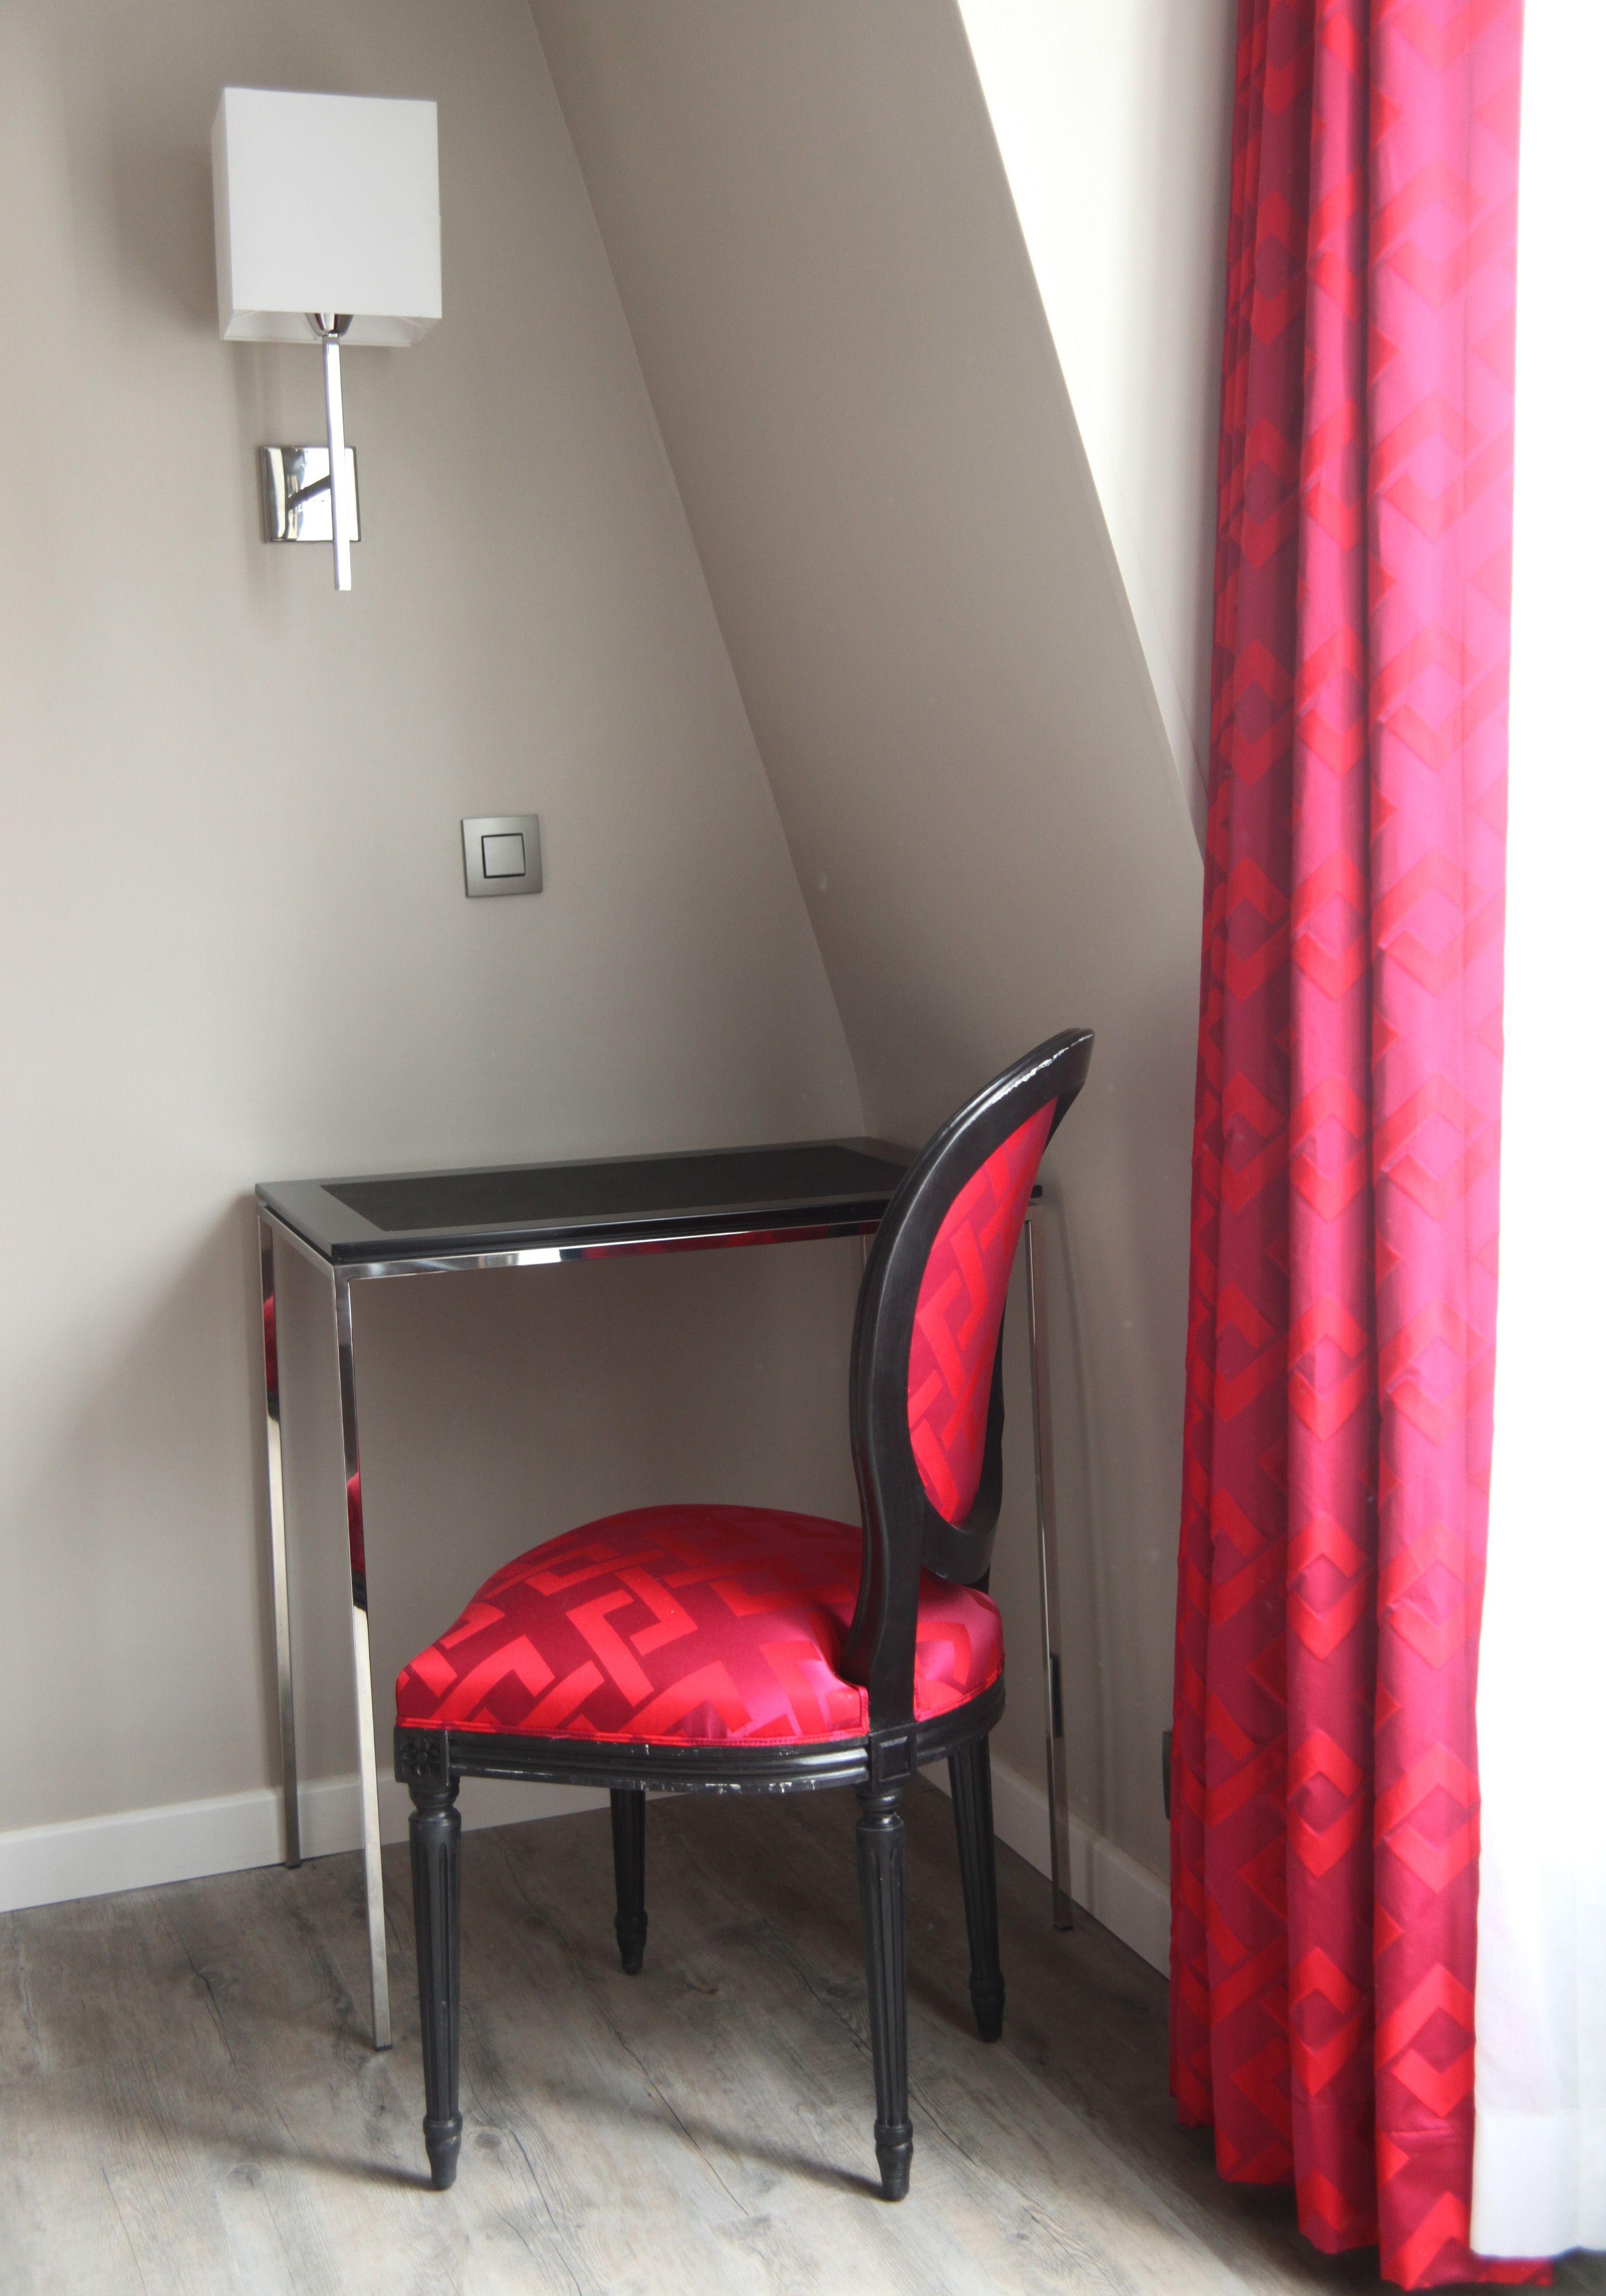 monica damonte interior designer ivano redaelli bed pillow hermes odulia alassio bed grey My Space